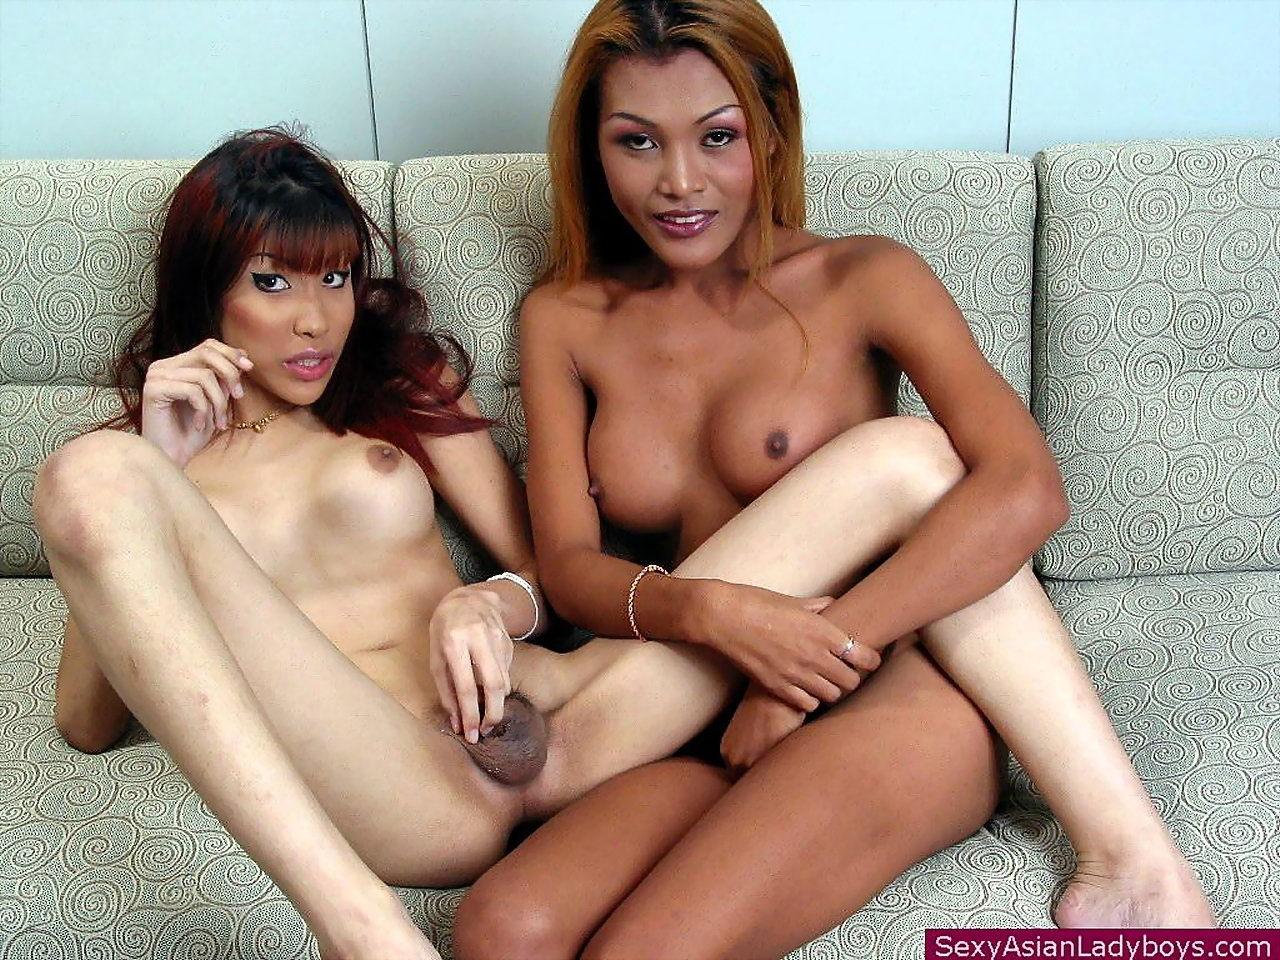 Two Joyful TGirls Play With Their Boobies And Pricks